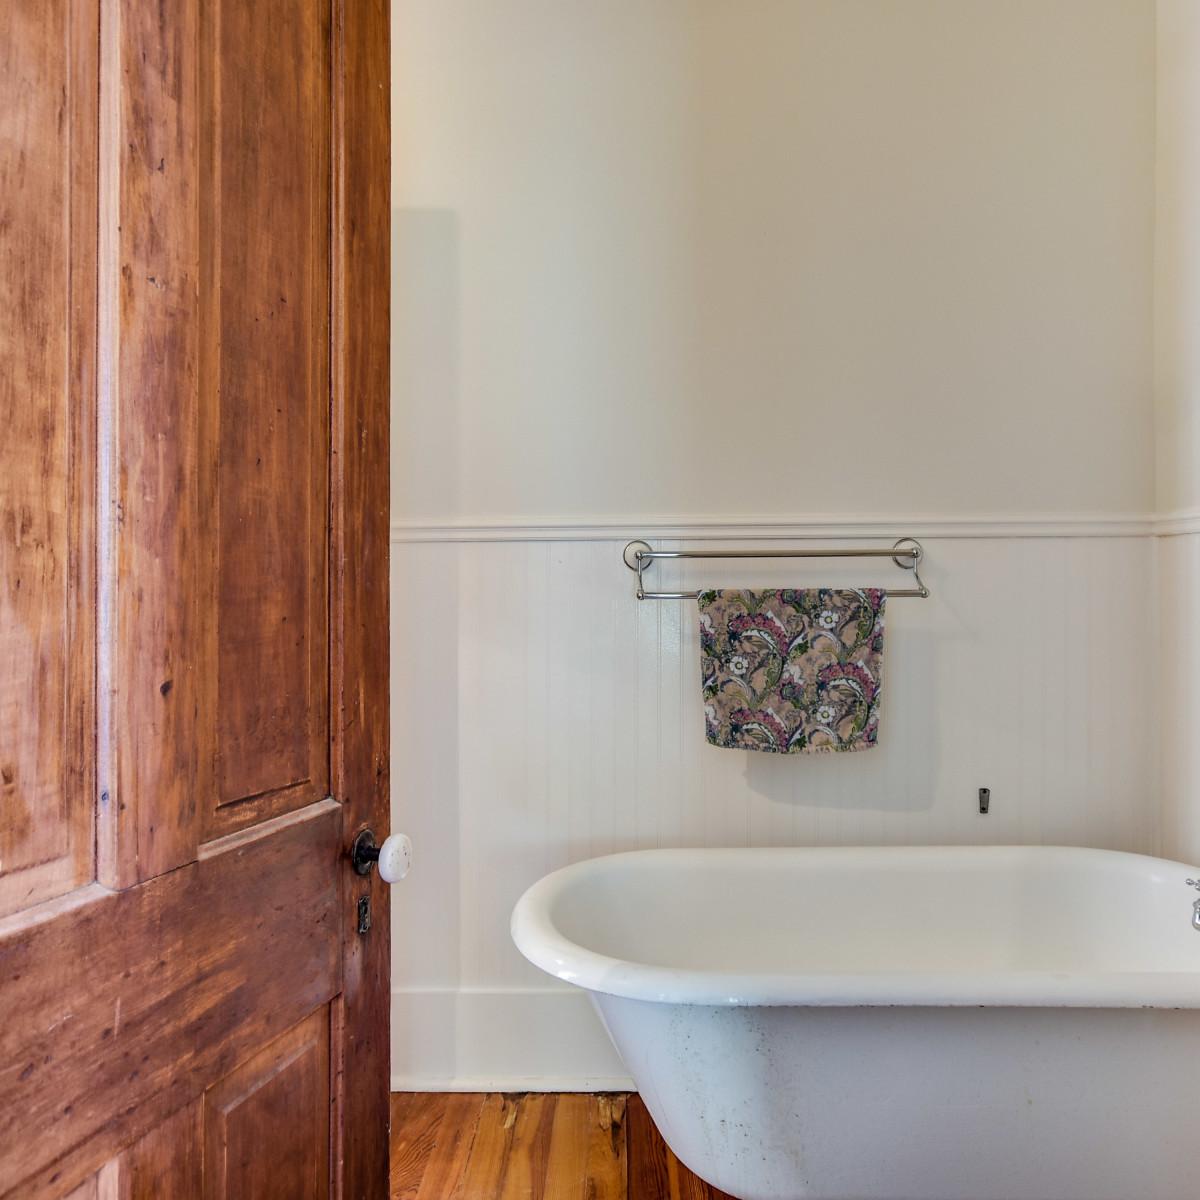 422 Mission San Antonio house for sale bathroom